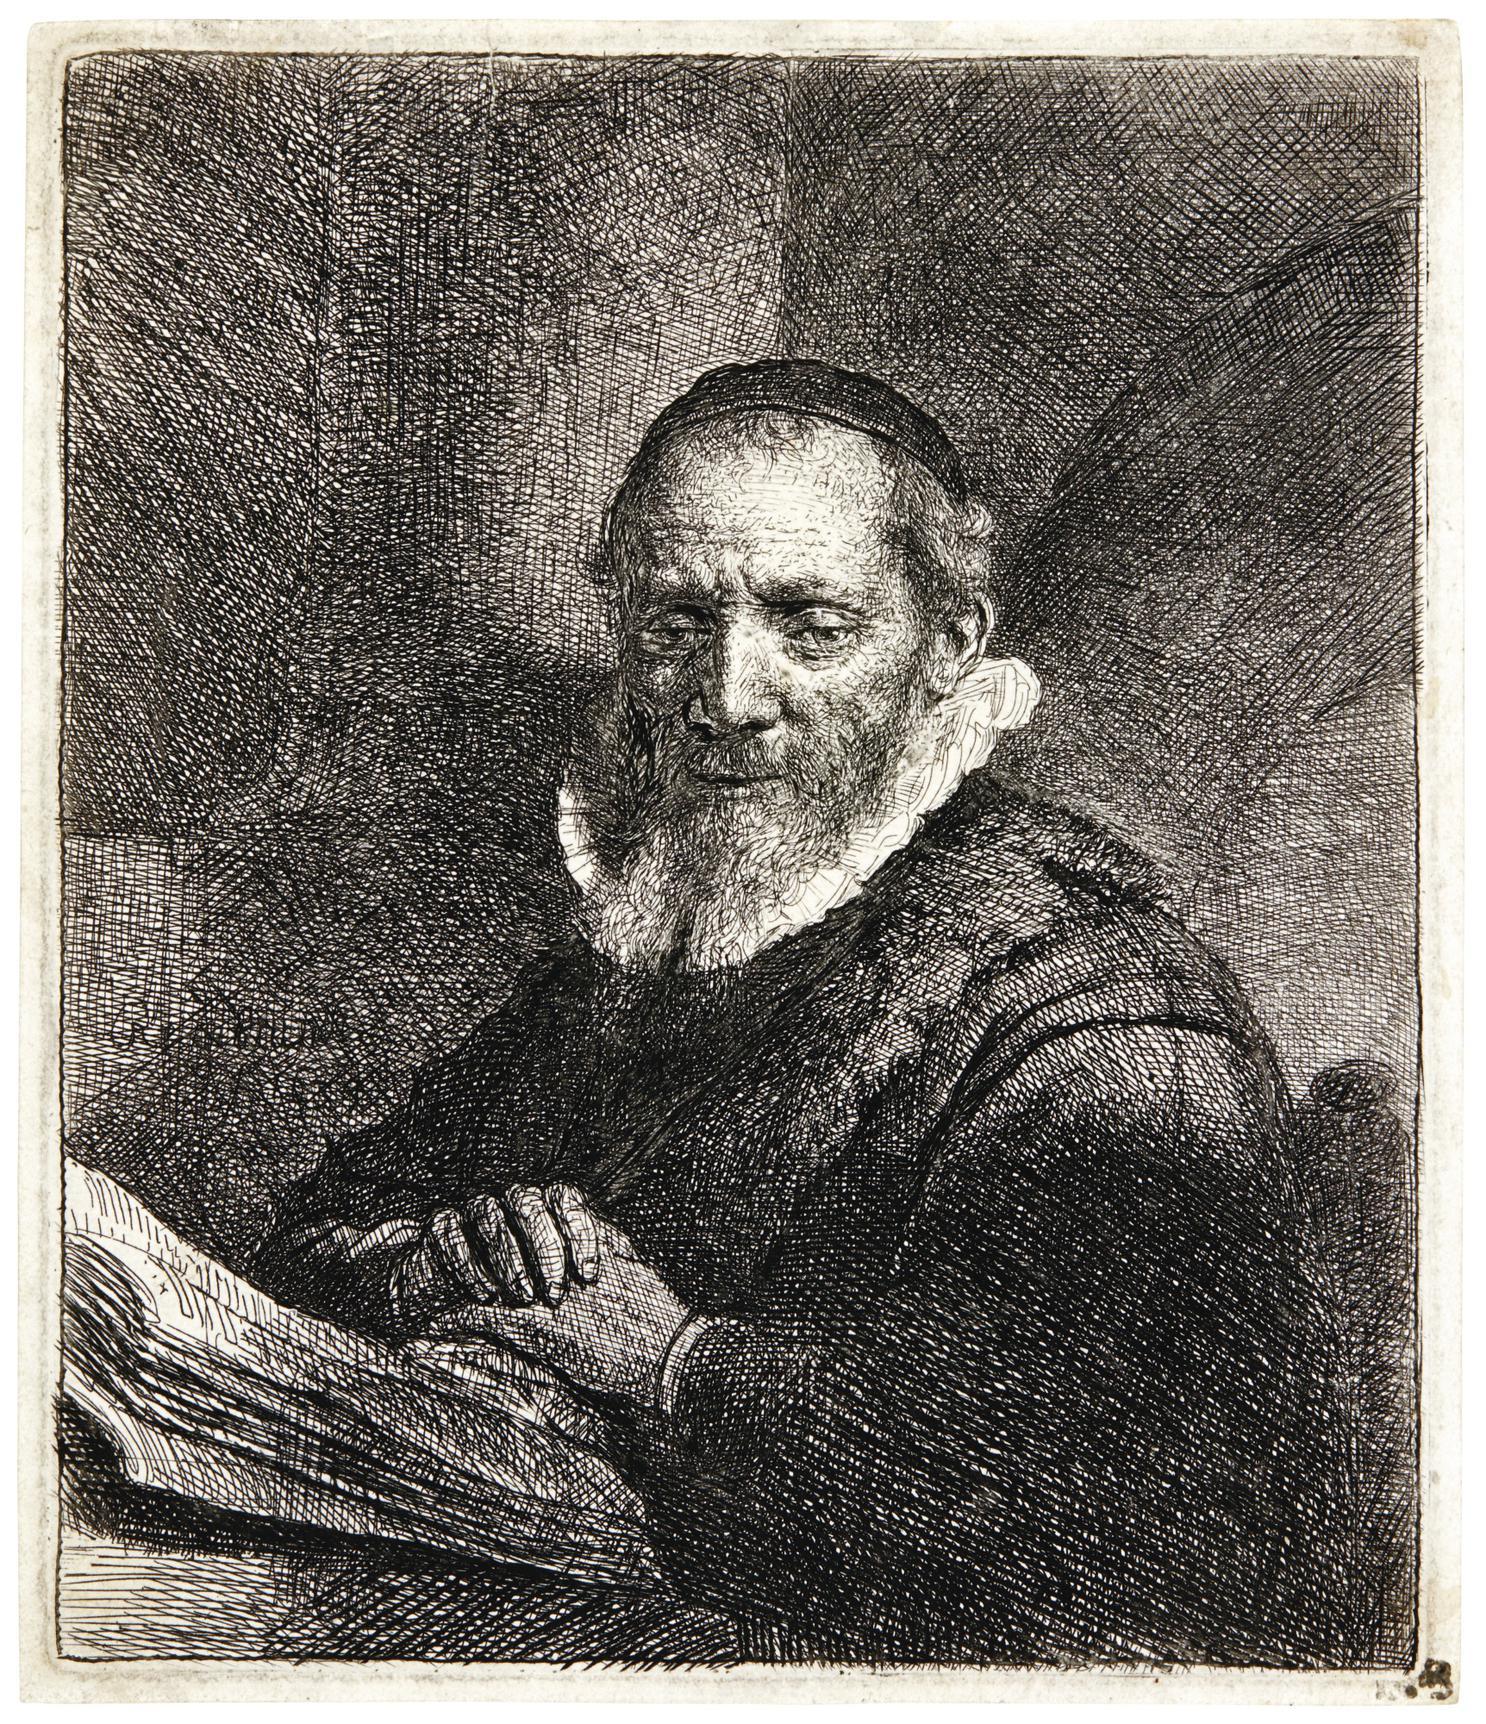 Rembrandt van Rijn-Jan Cornelis Sylvius (B., Holl. 266; New Holl. 124; H. 111)-1633